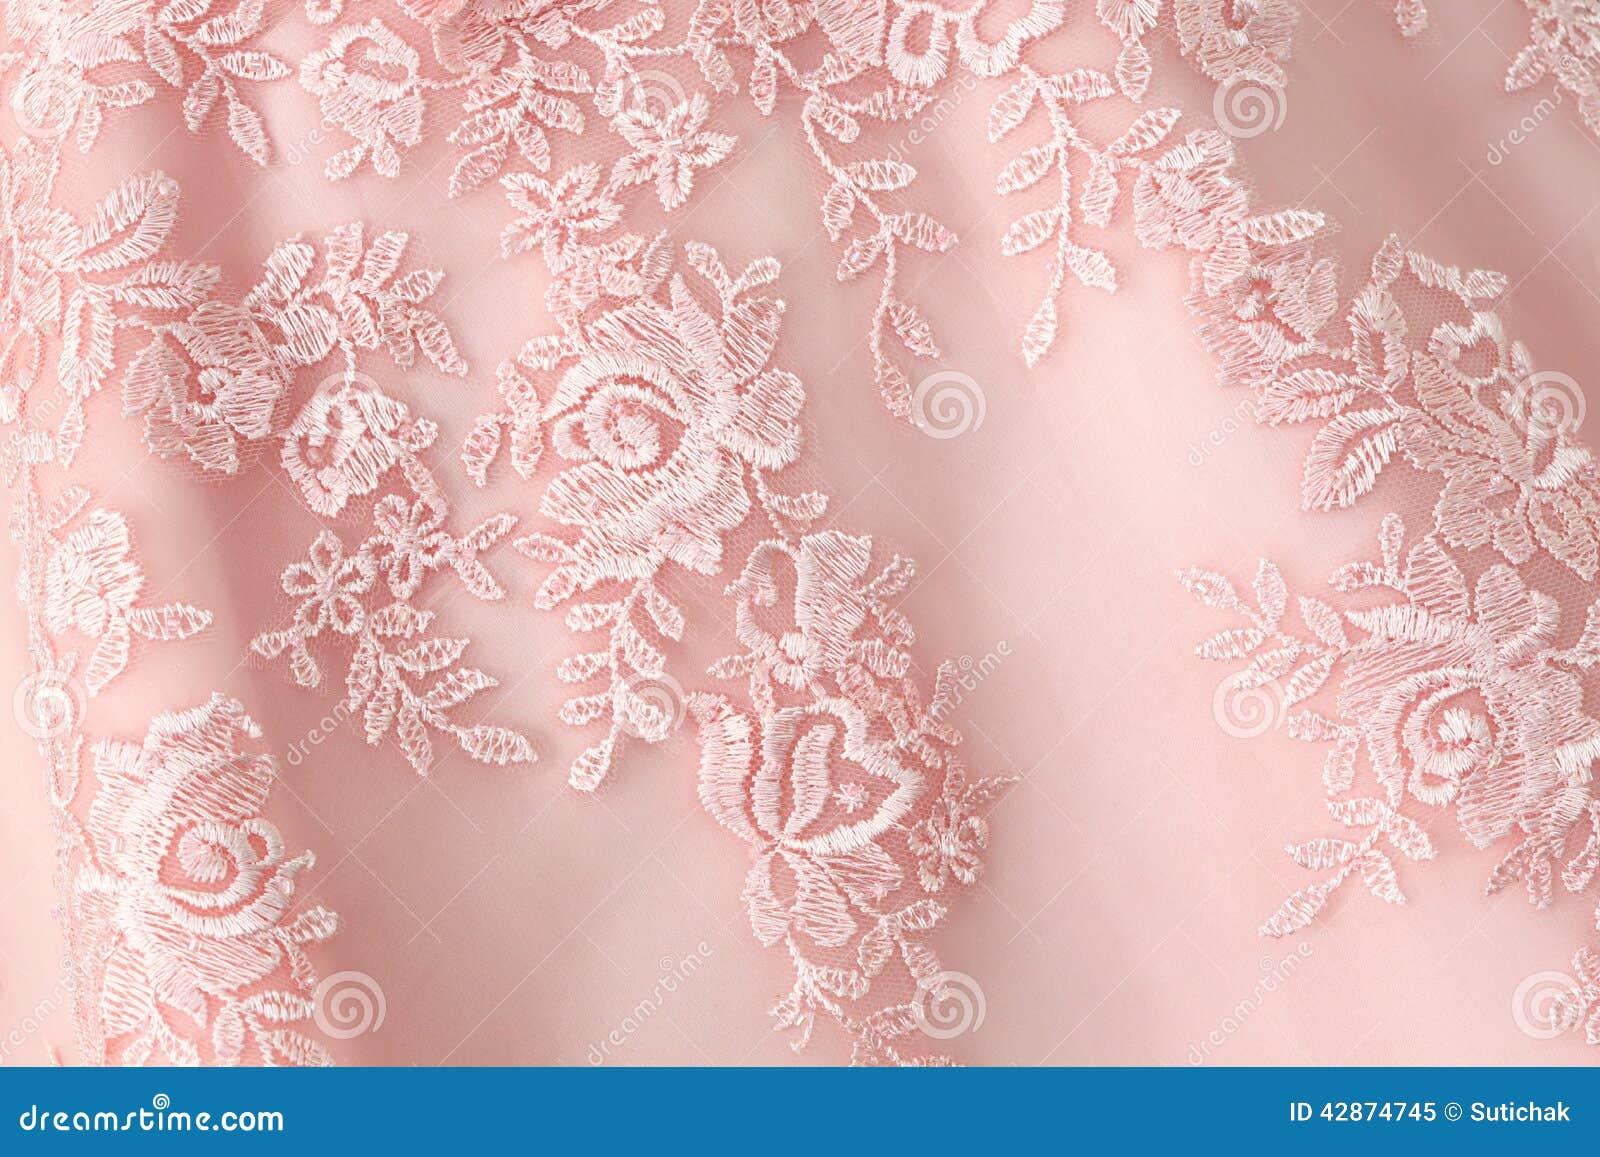 Wedding Dress Texture Stock Image. Image Of Silk, Craft